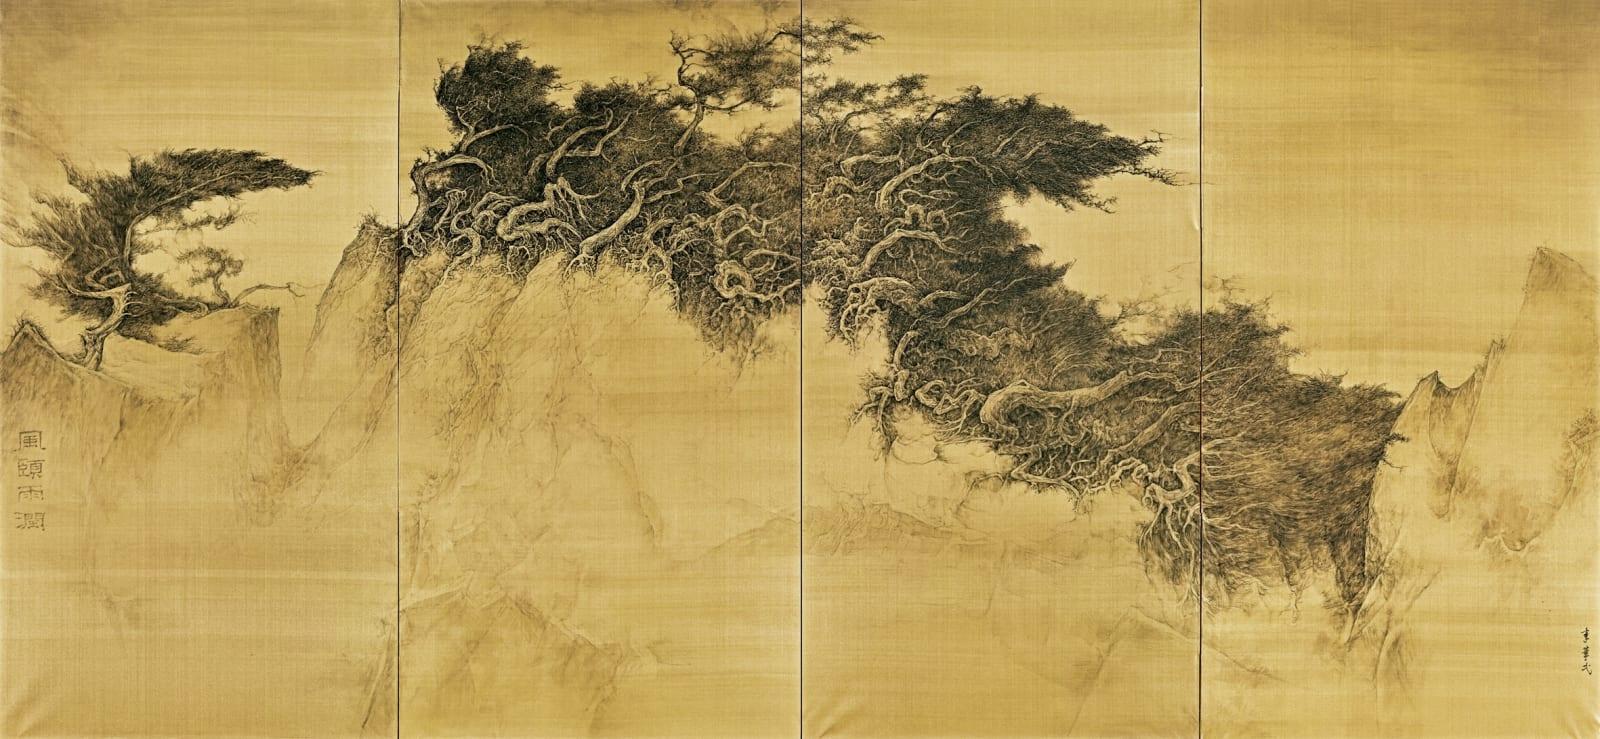 Li Huayi 李華弌, Enchanting Breeze and Nourishing Rain 《風頤雨潤》, 2016